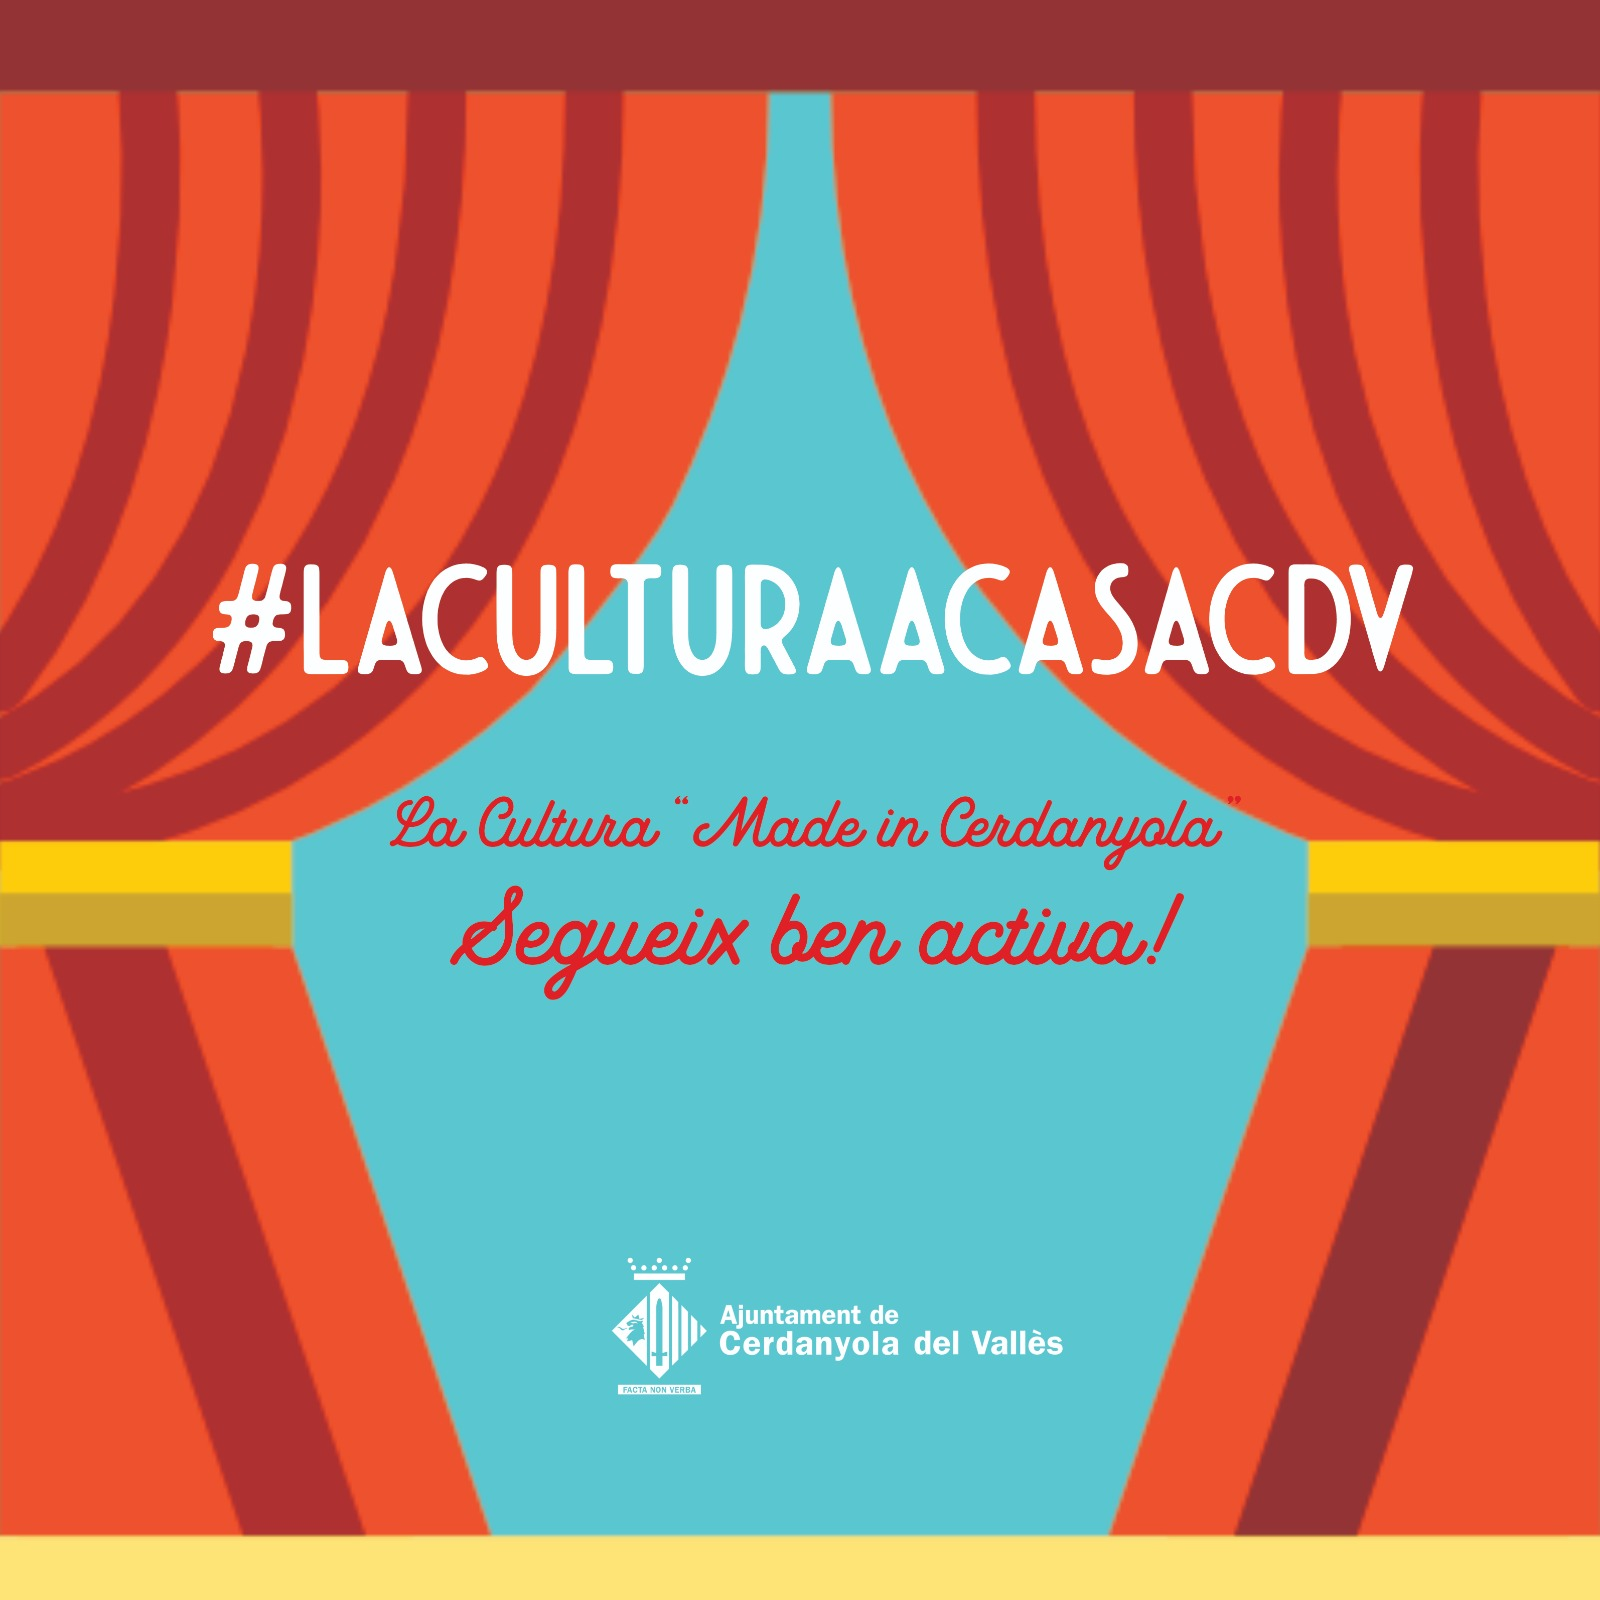 Imatge de la inictativa #laculturaacasacdv